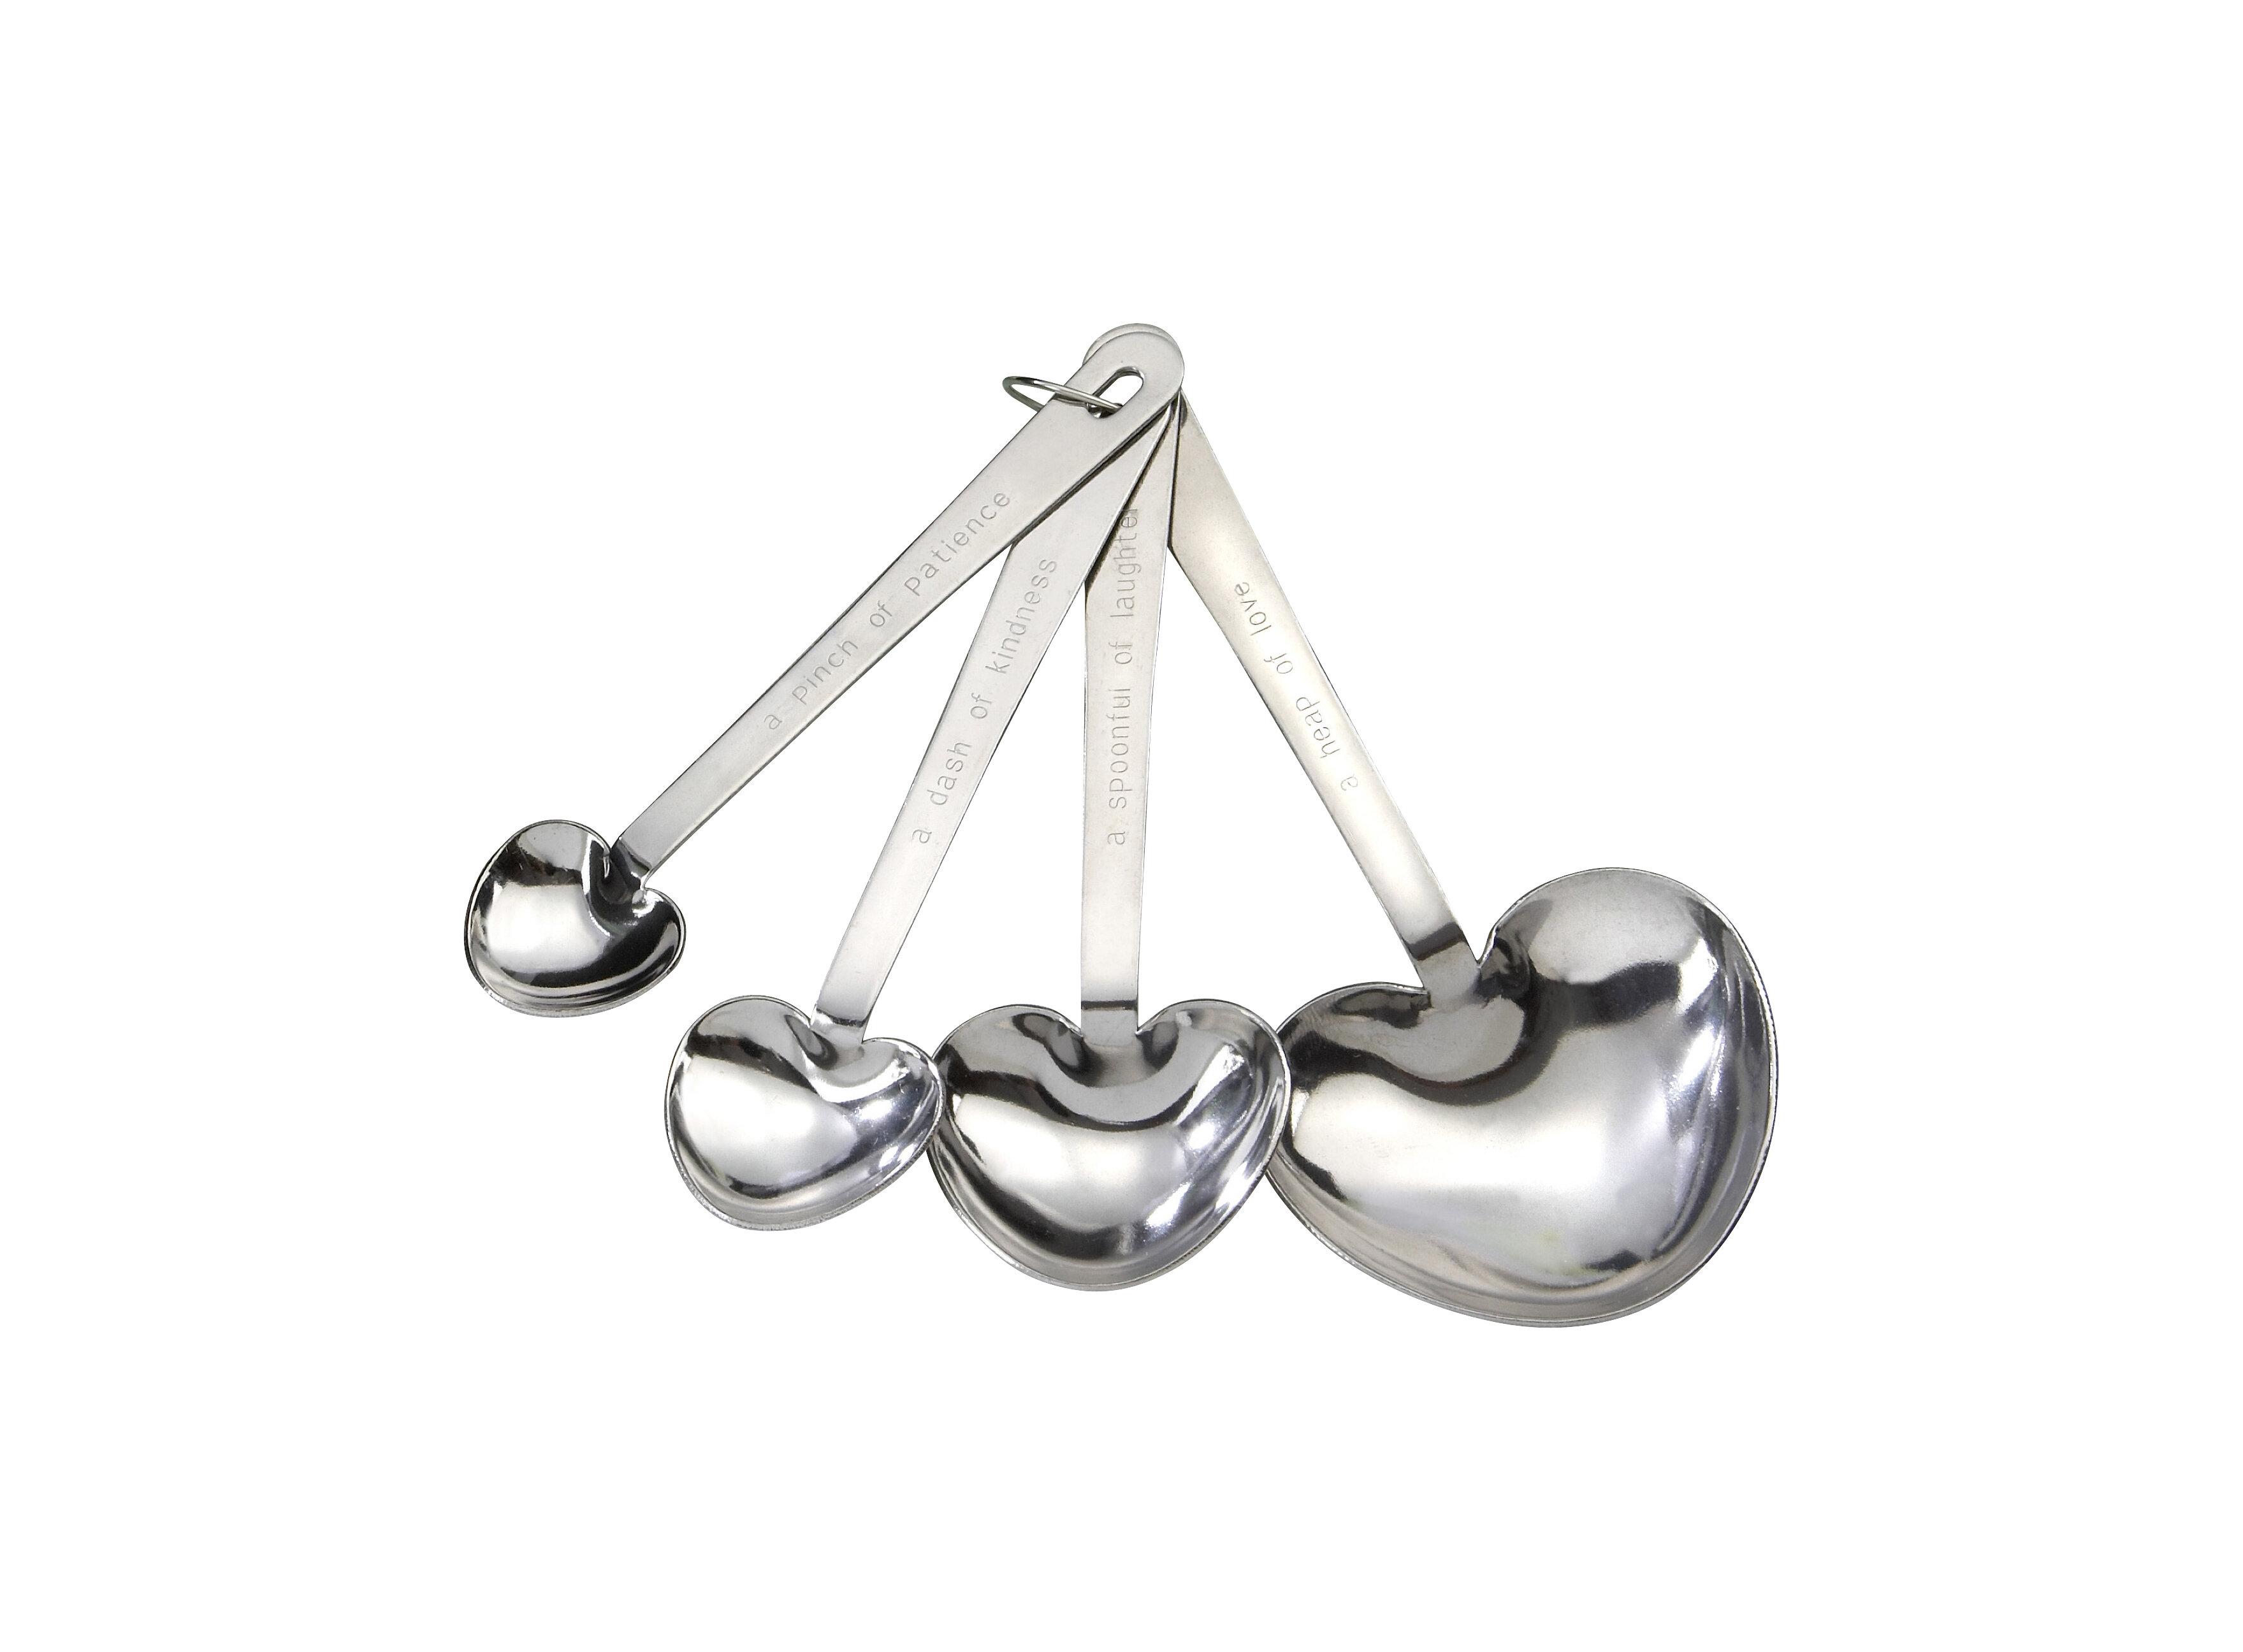 Kate Aspen \'\'Love Beyond Measure\'\' 4-Piece Stainless Steel Measuring ...